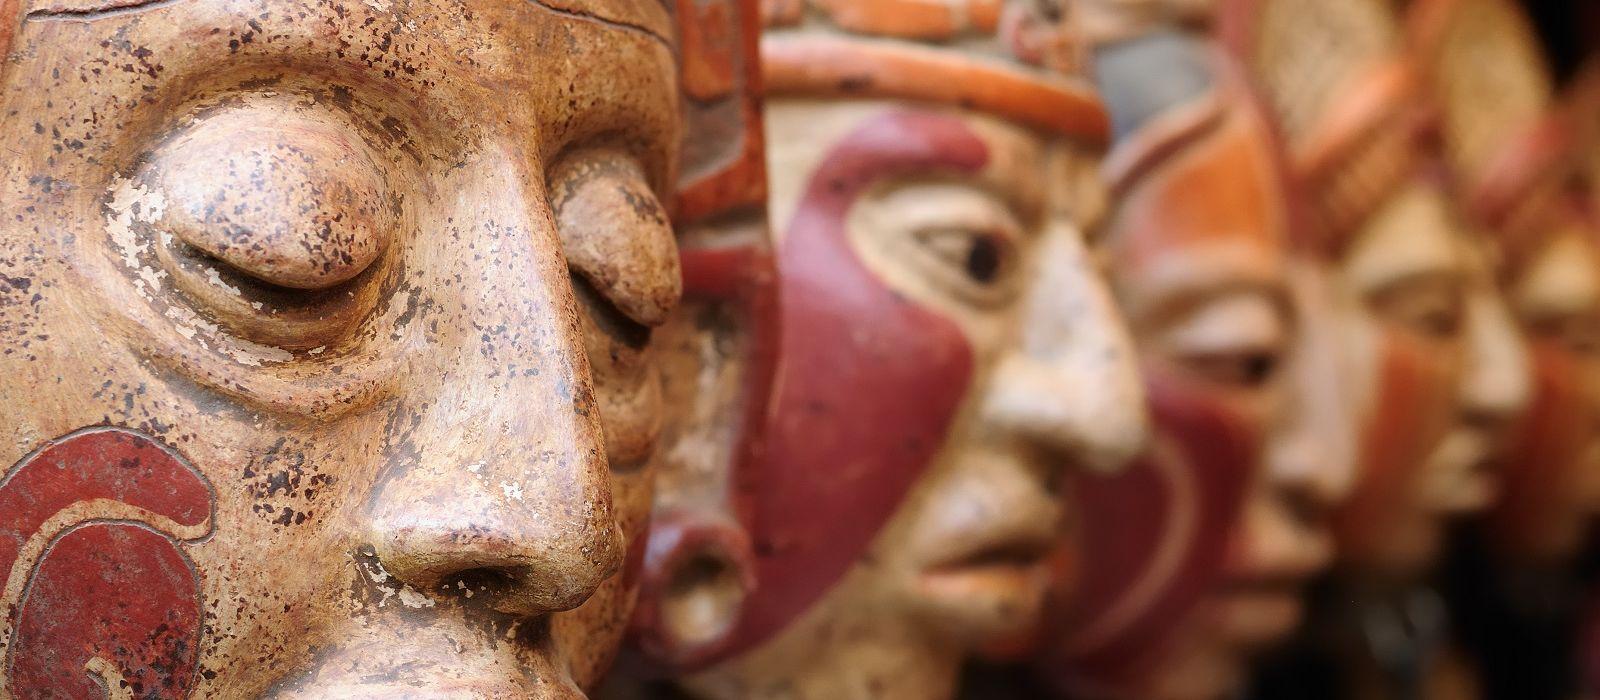 Culture of Guatemala